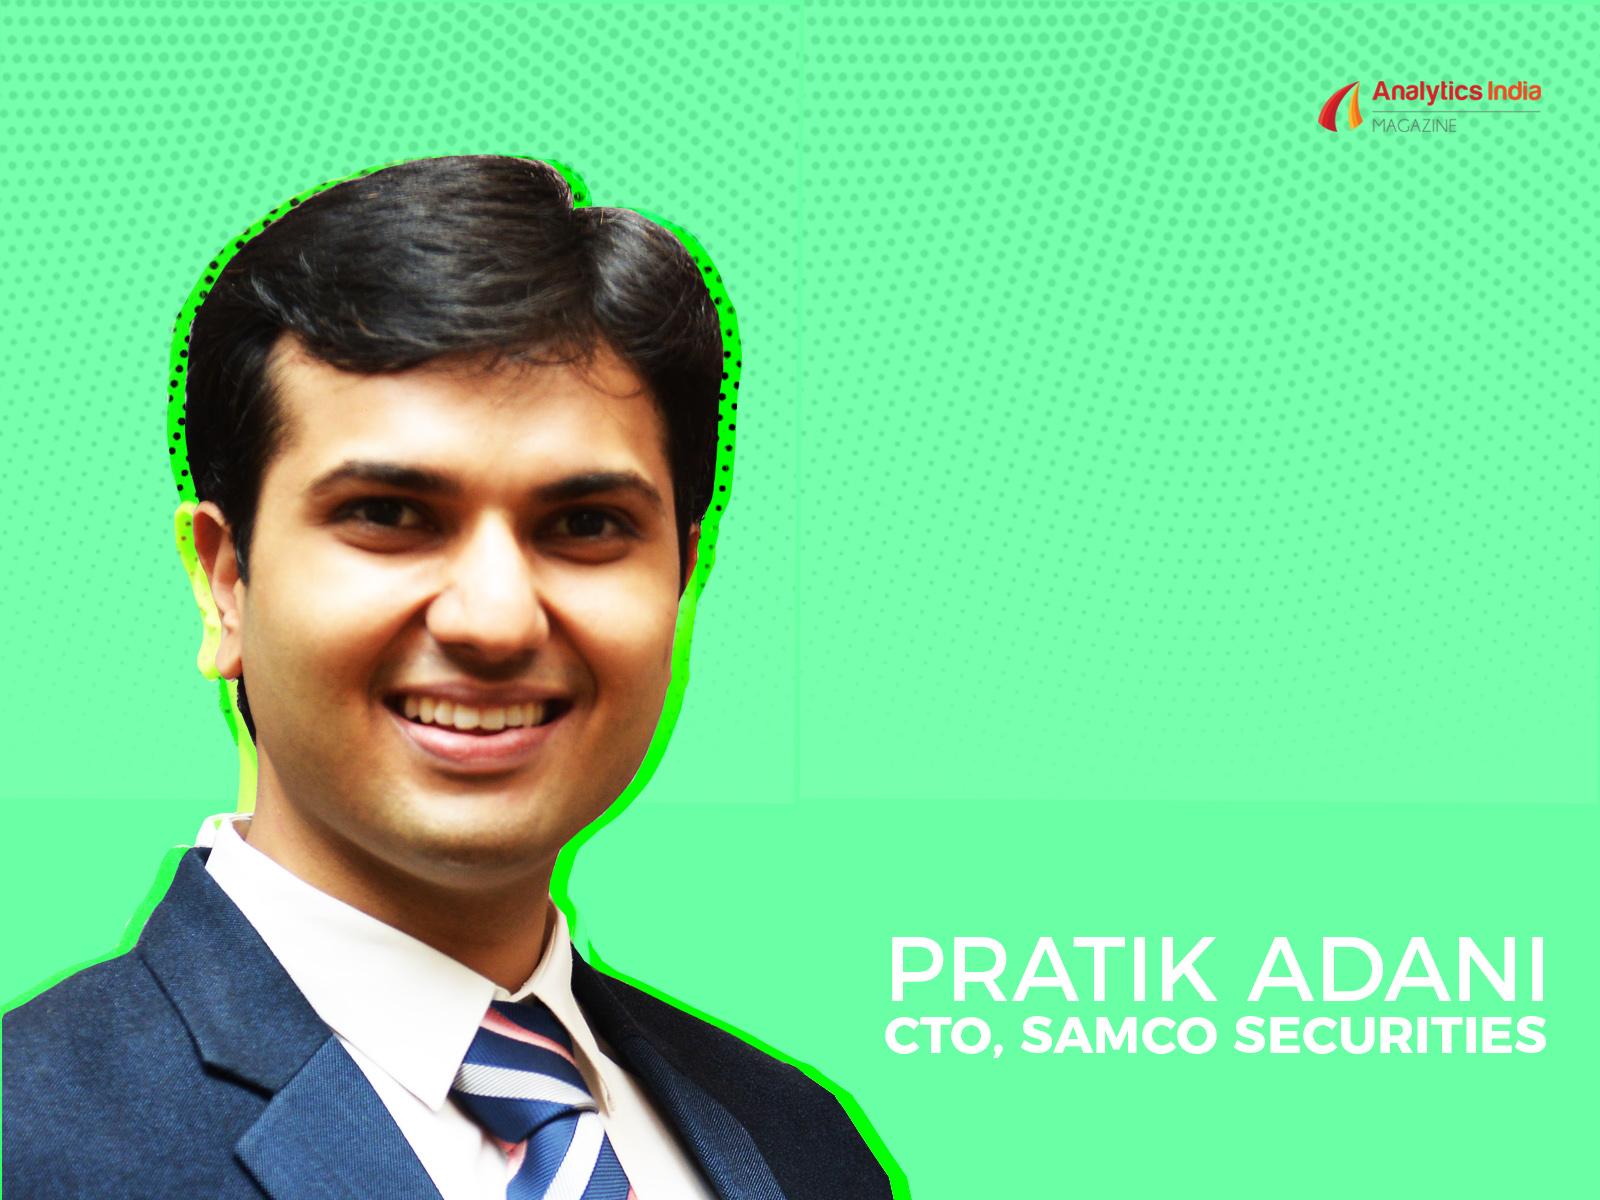 Pratik Adani CTO SAMCO Securities